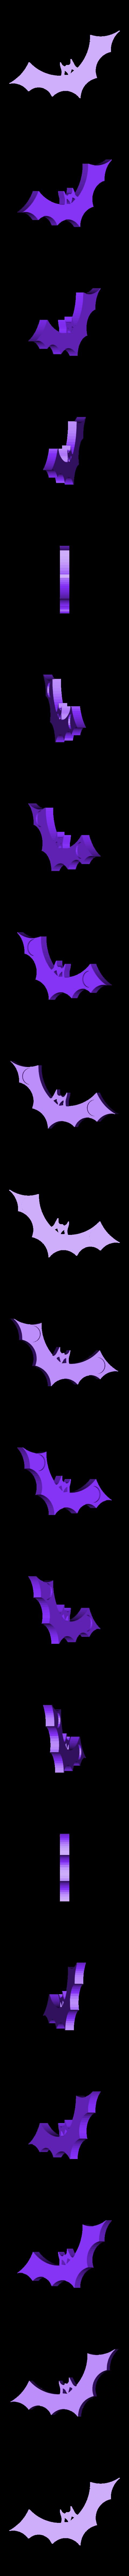 bat.stl Download free STL file Halloween Bat Fridge Magnet • Object to 3D print, Louisdelgado678